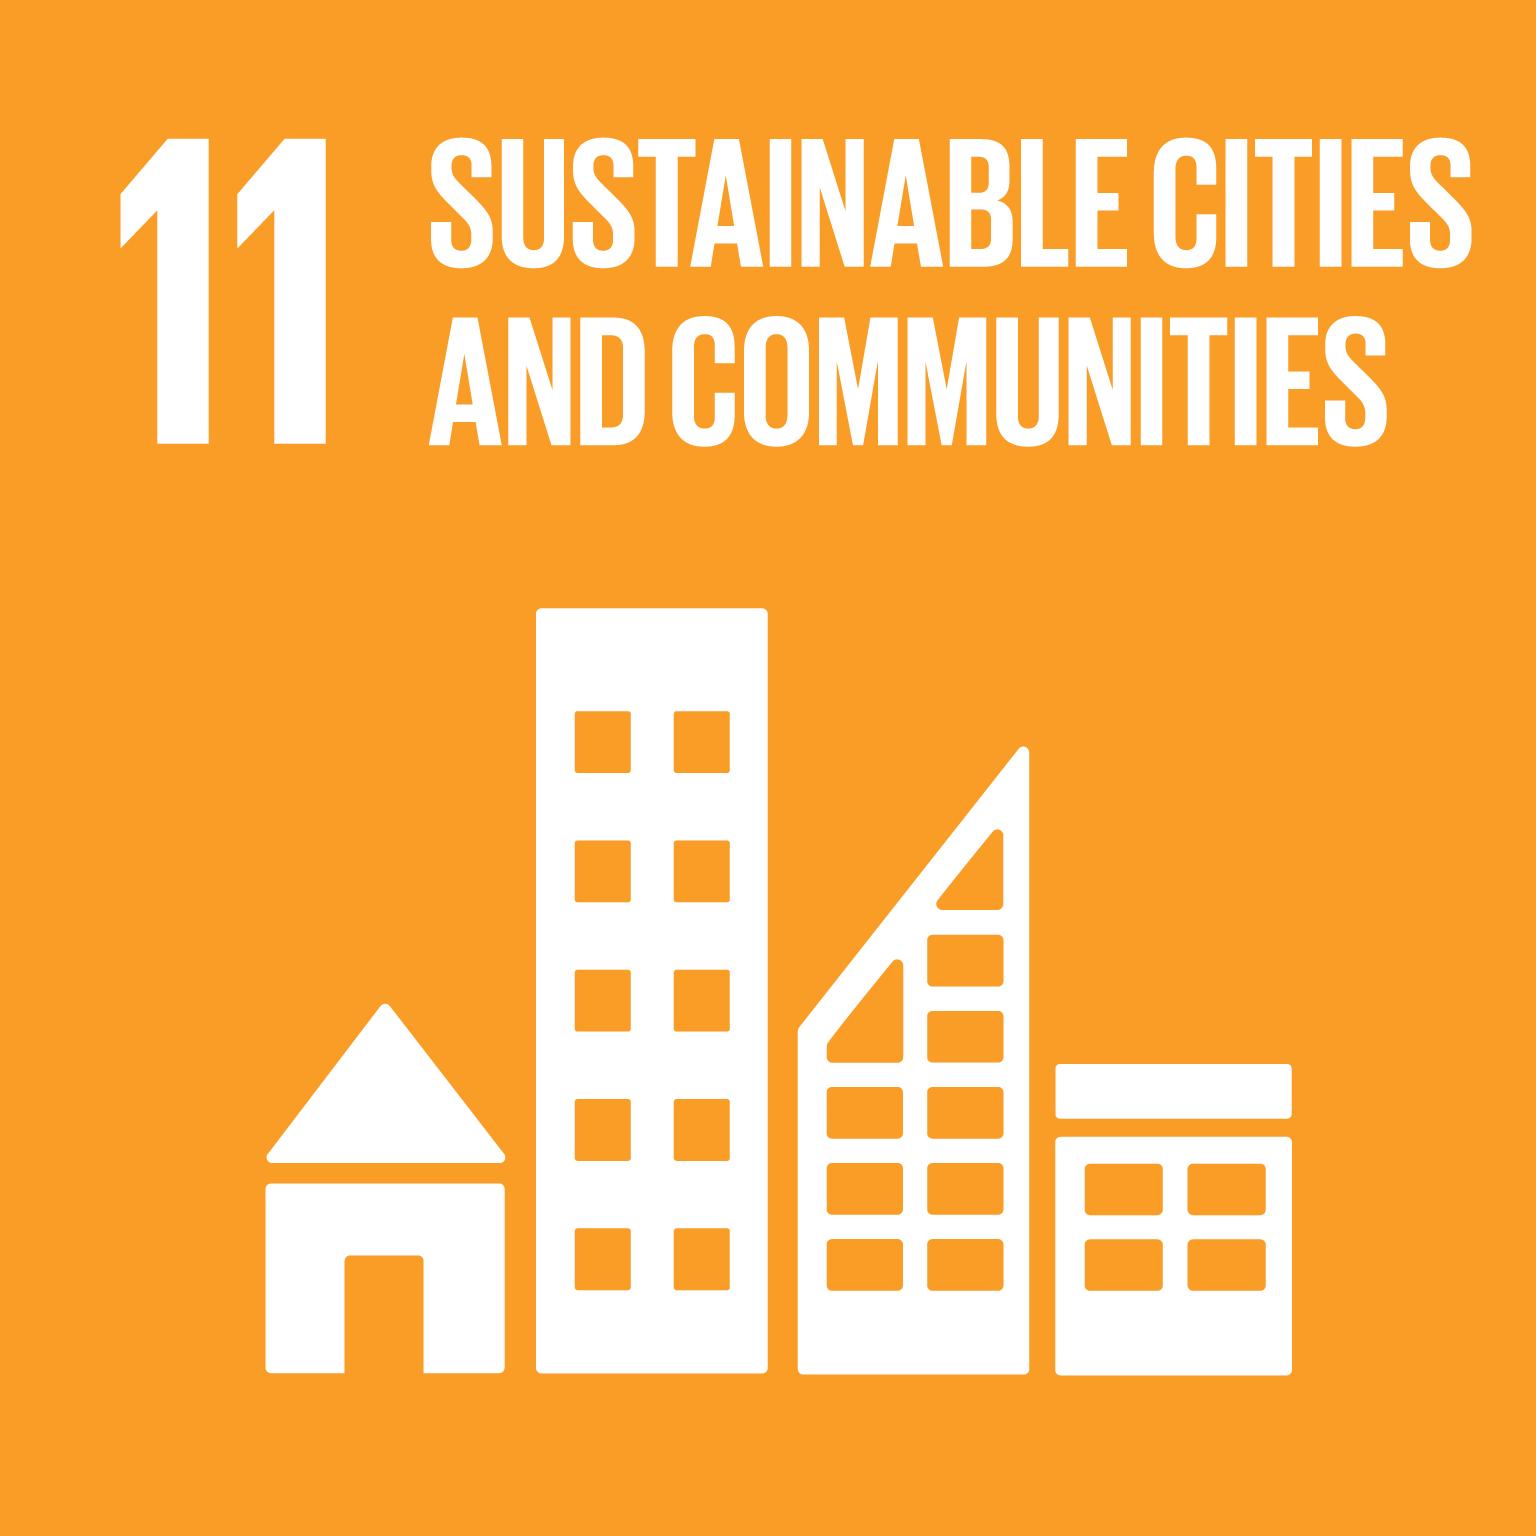 E_SDG goals_icons-individual-rgb-11